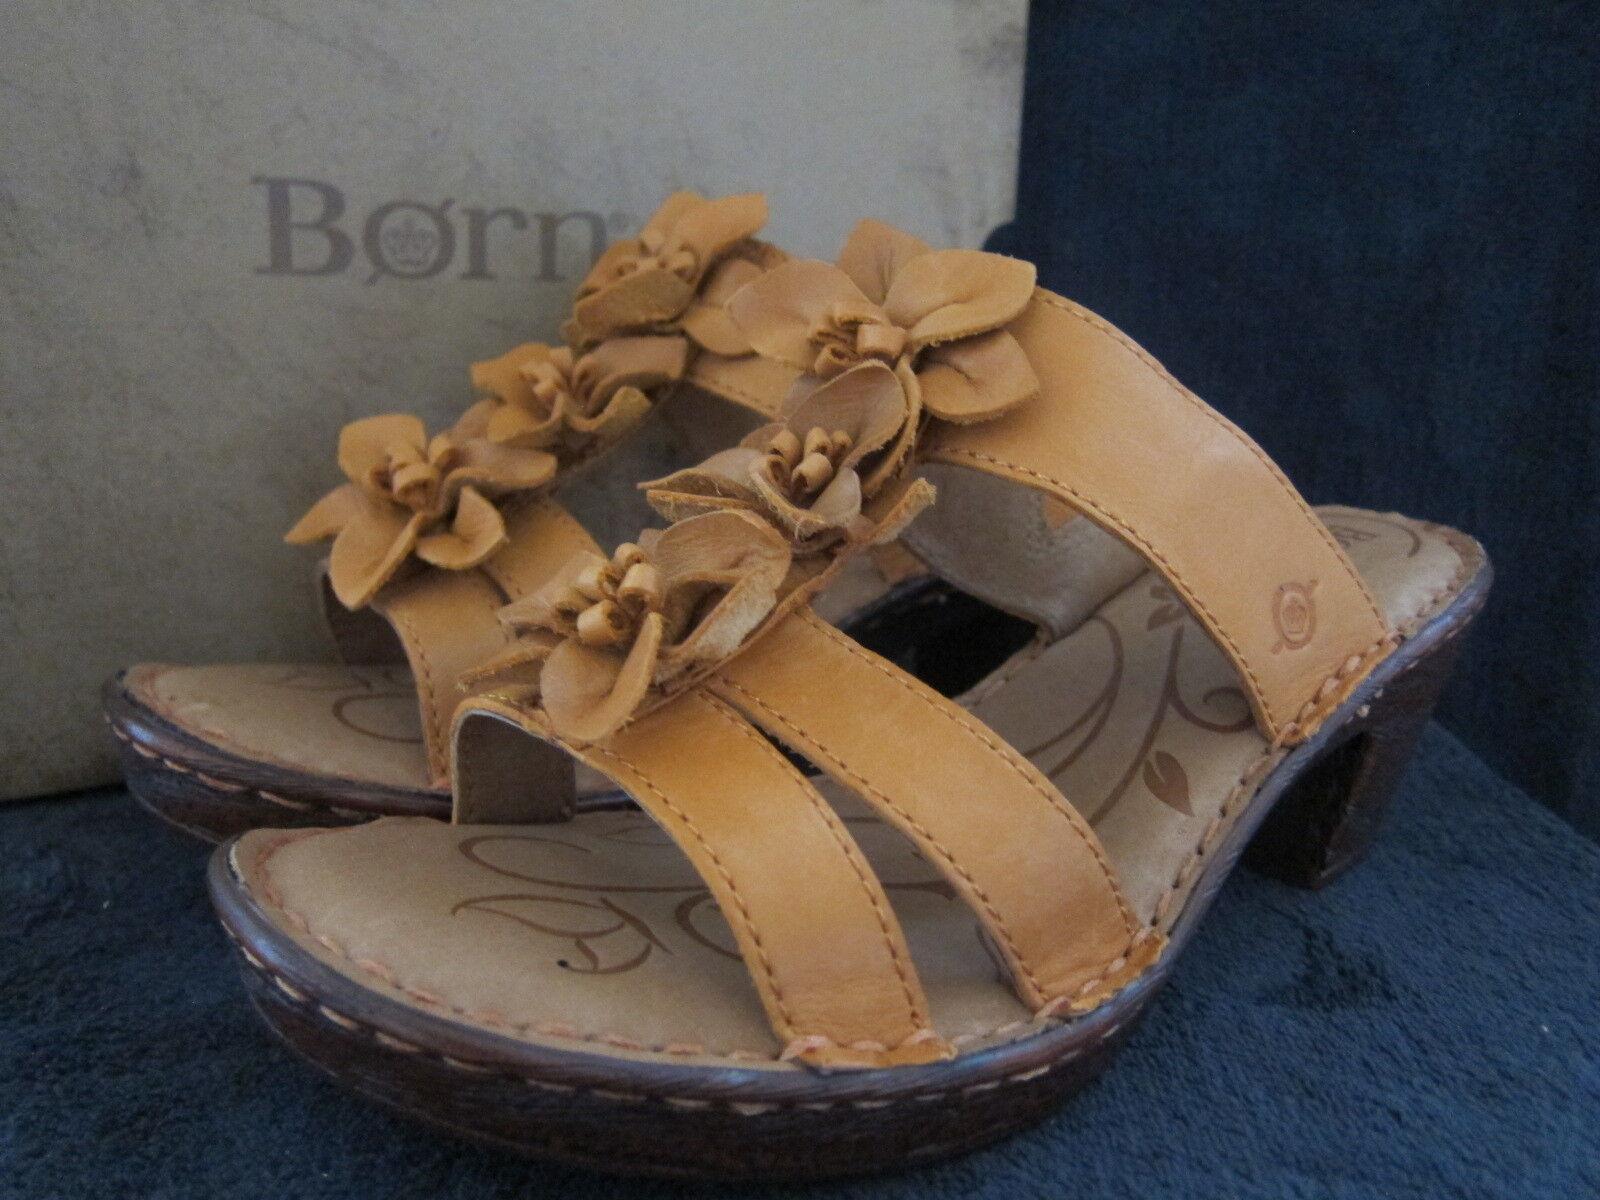 BORN Zenia Slide arancia Open Toe Platform Platform Platform Sandals Heels scarpe US 9 EUR 40.5 NWB 3eea8b